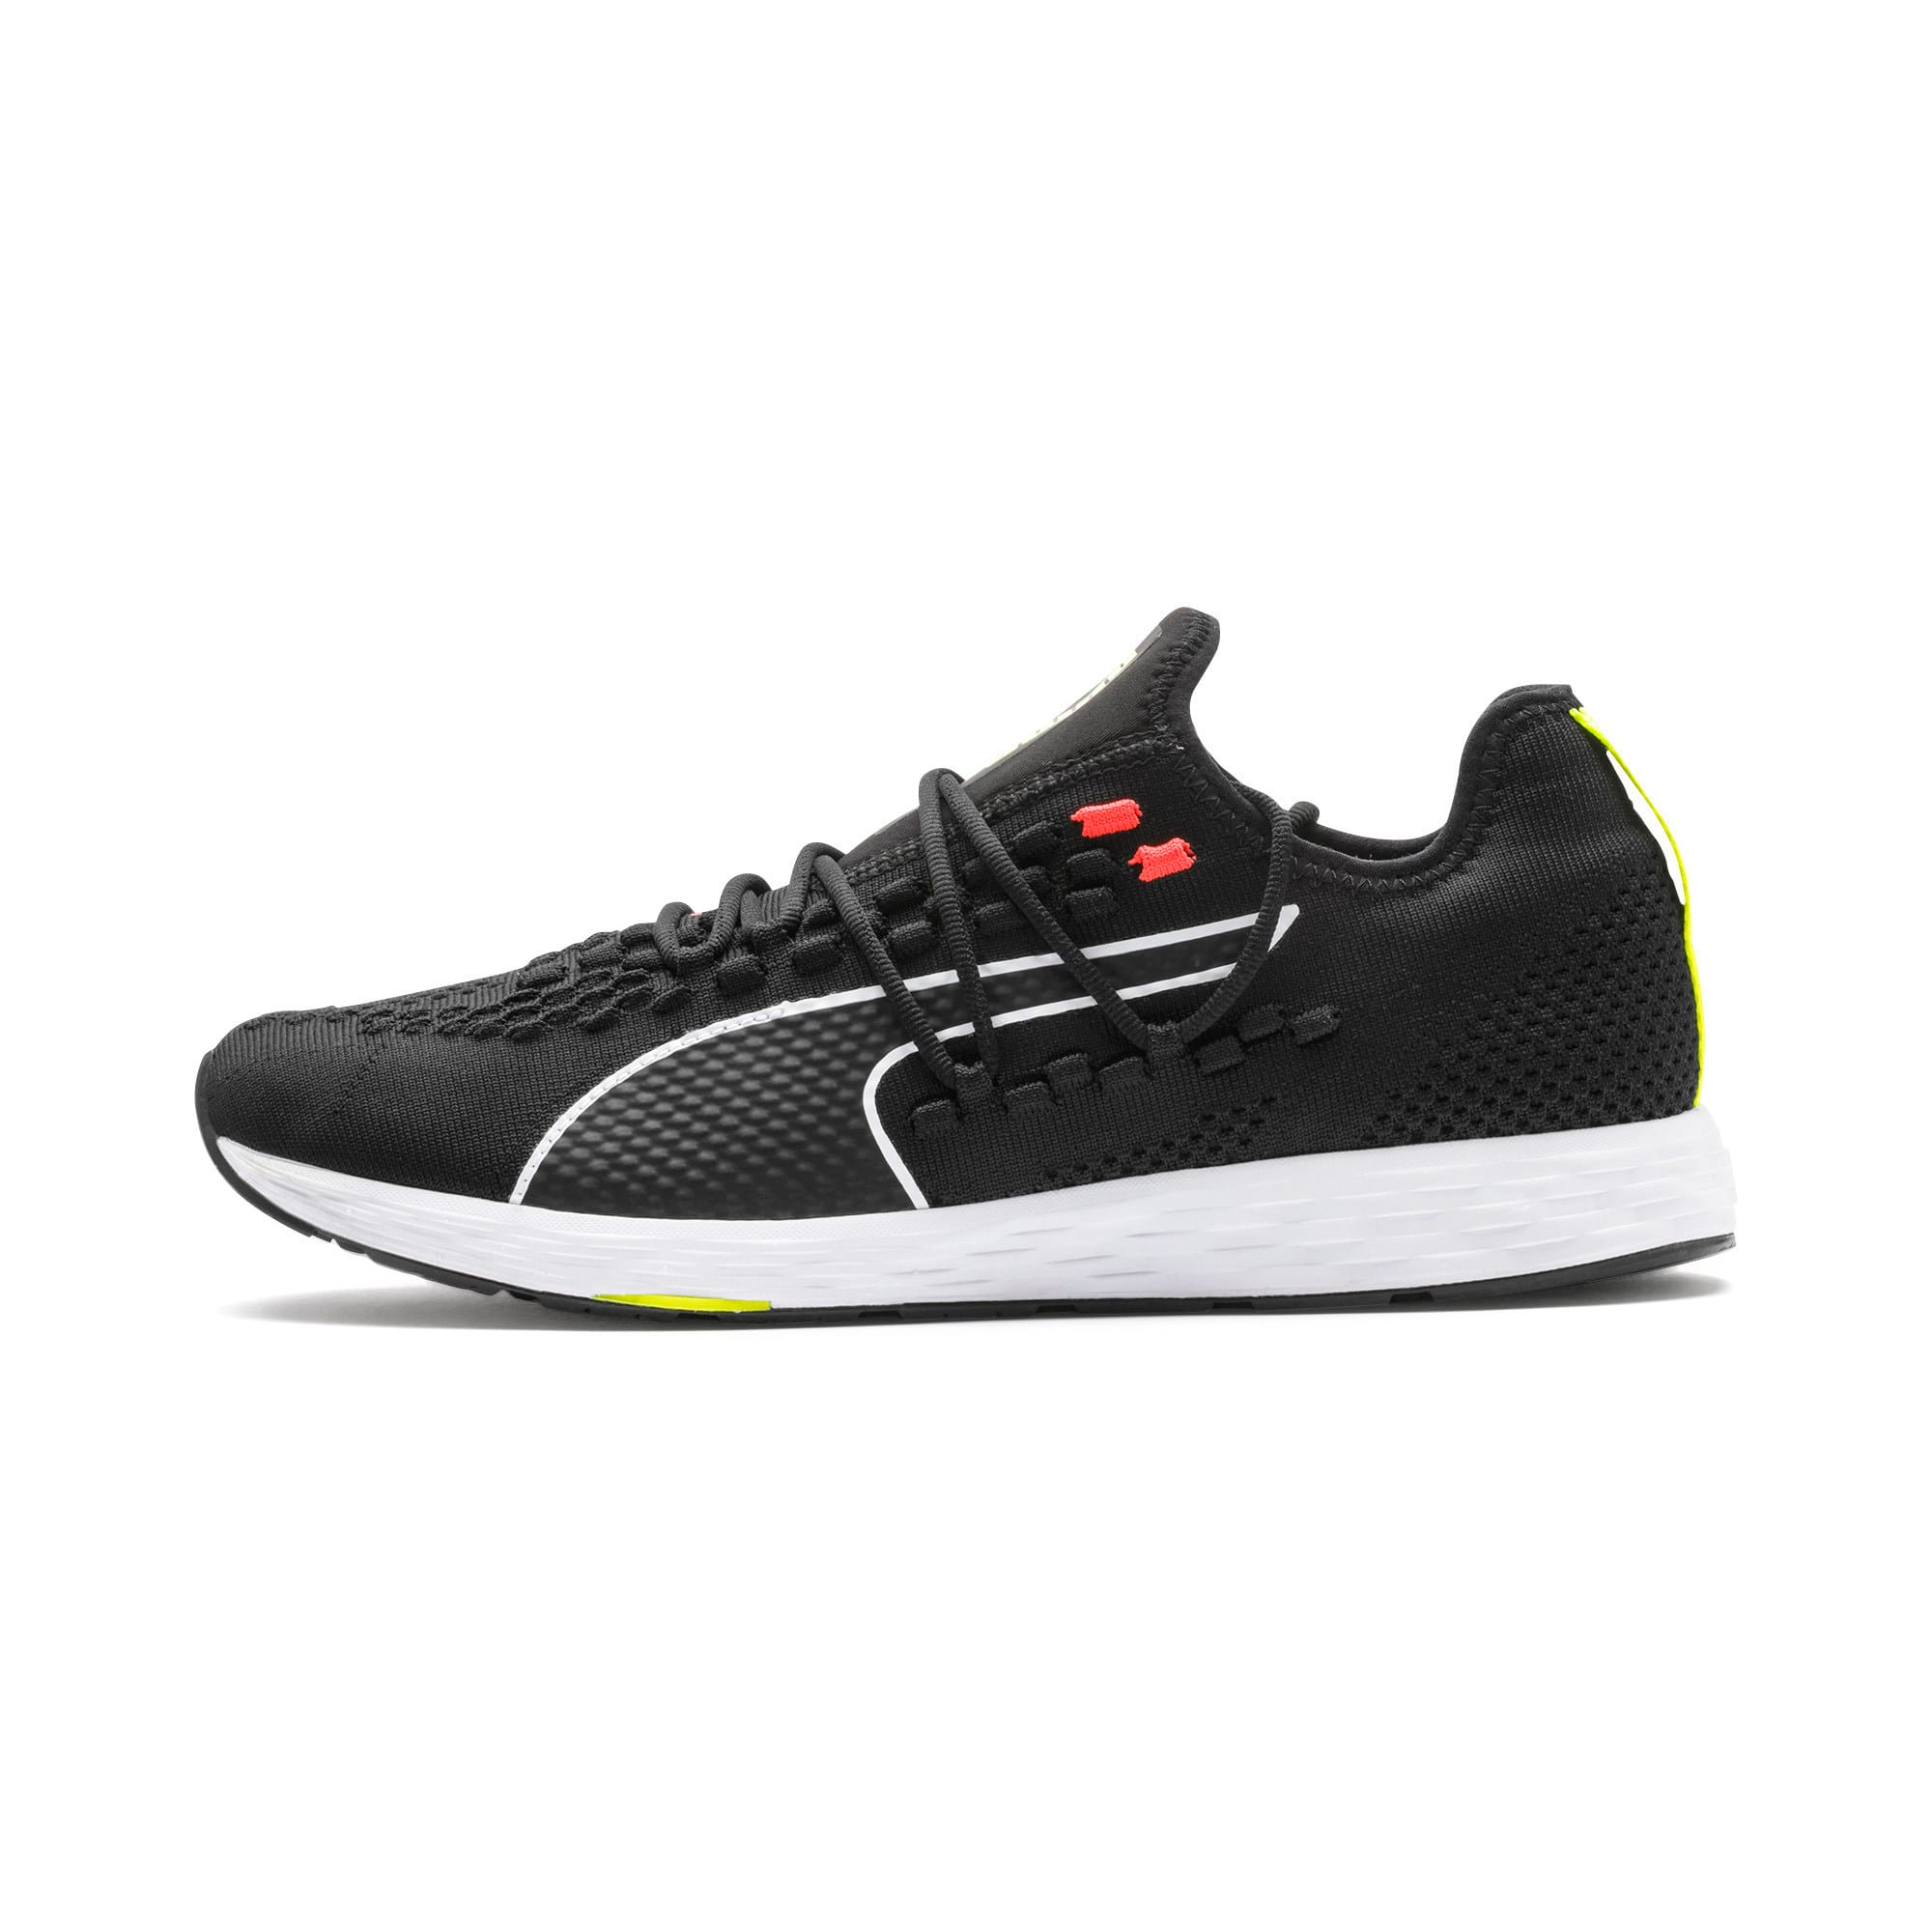 Thumbnail 1 of SPEED RACER Running Shoes, Black-Nrgy Red-Yellow Alert, medium